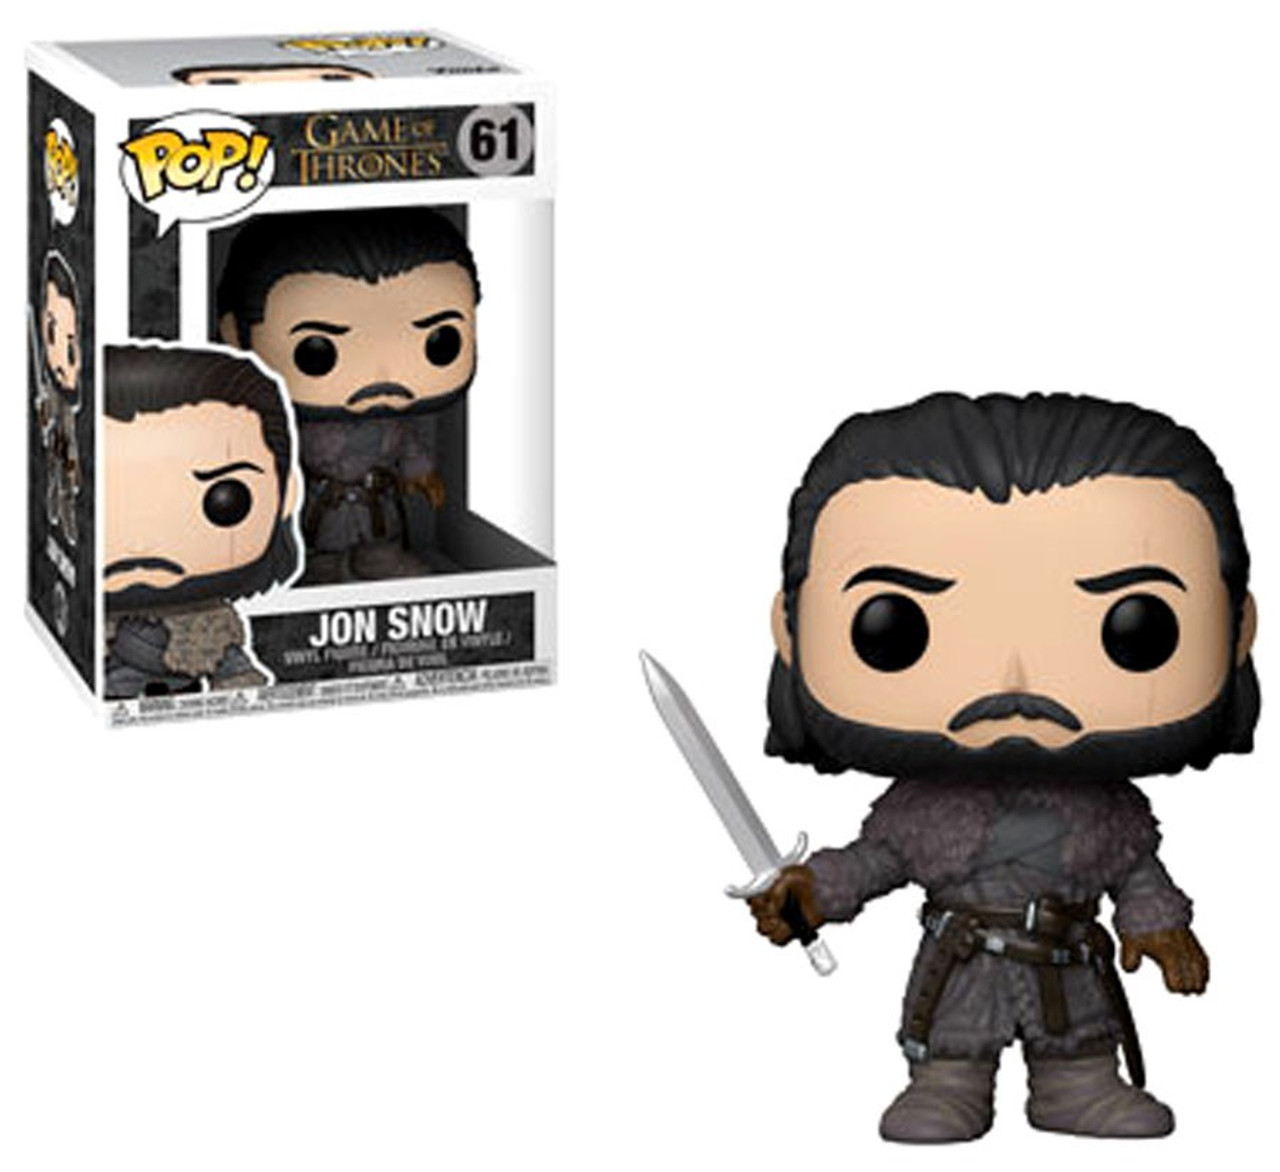 #49 Funko POP Game of Thrones GOT Jon Snow Action Figure